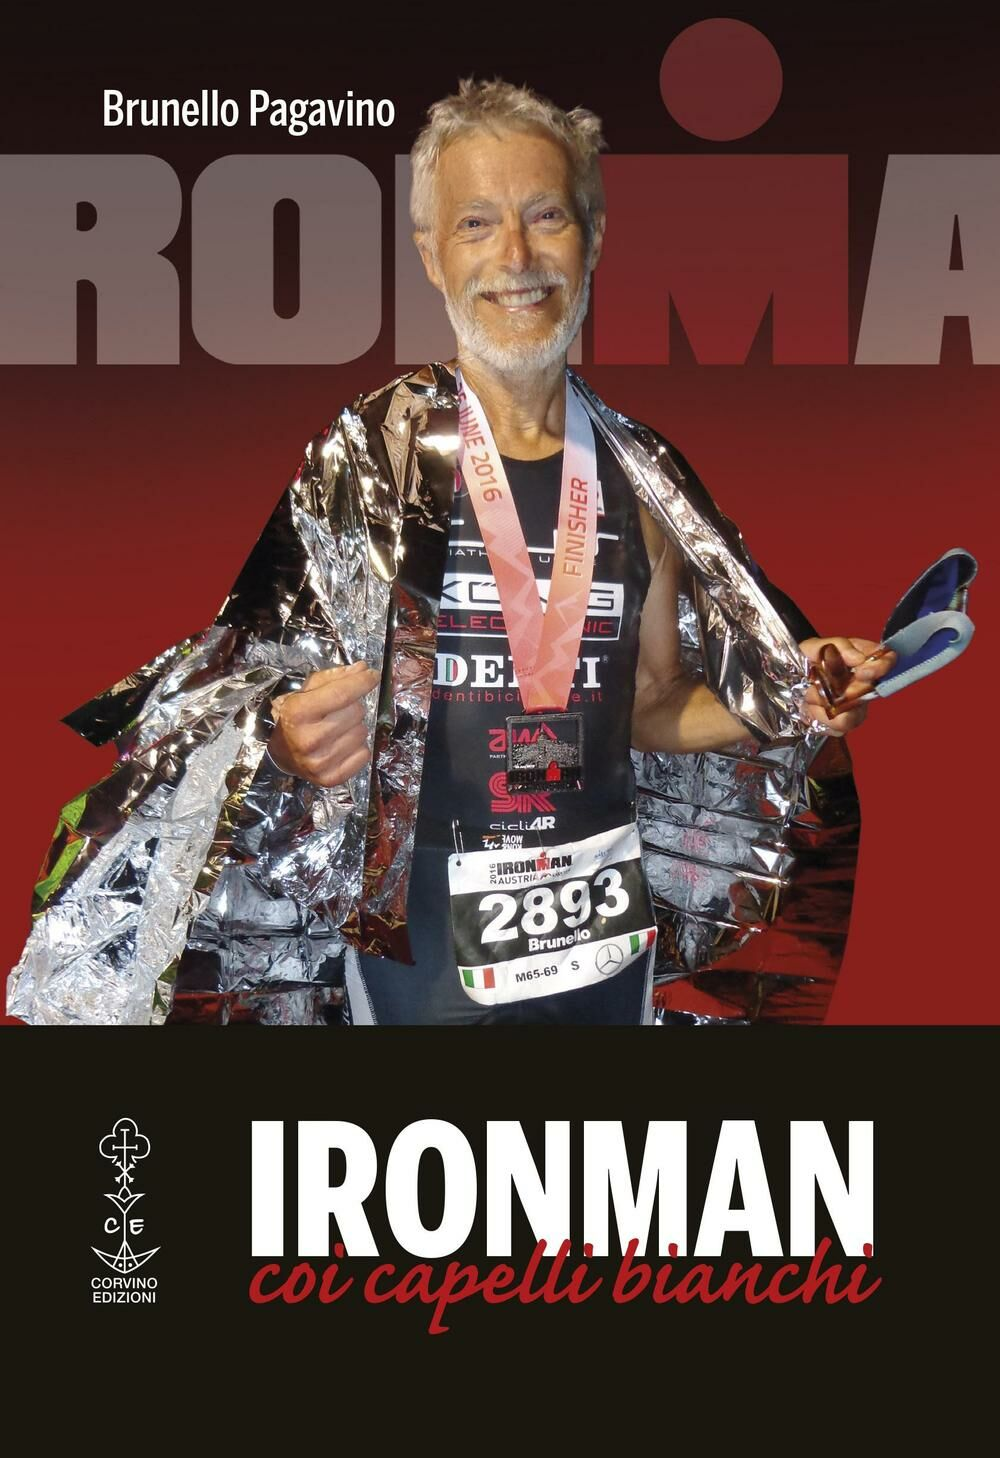 Ironman coi capelli bianchi